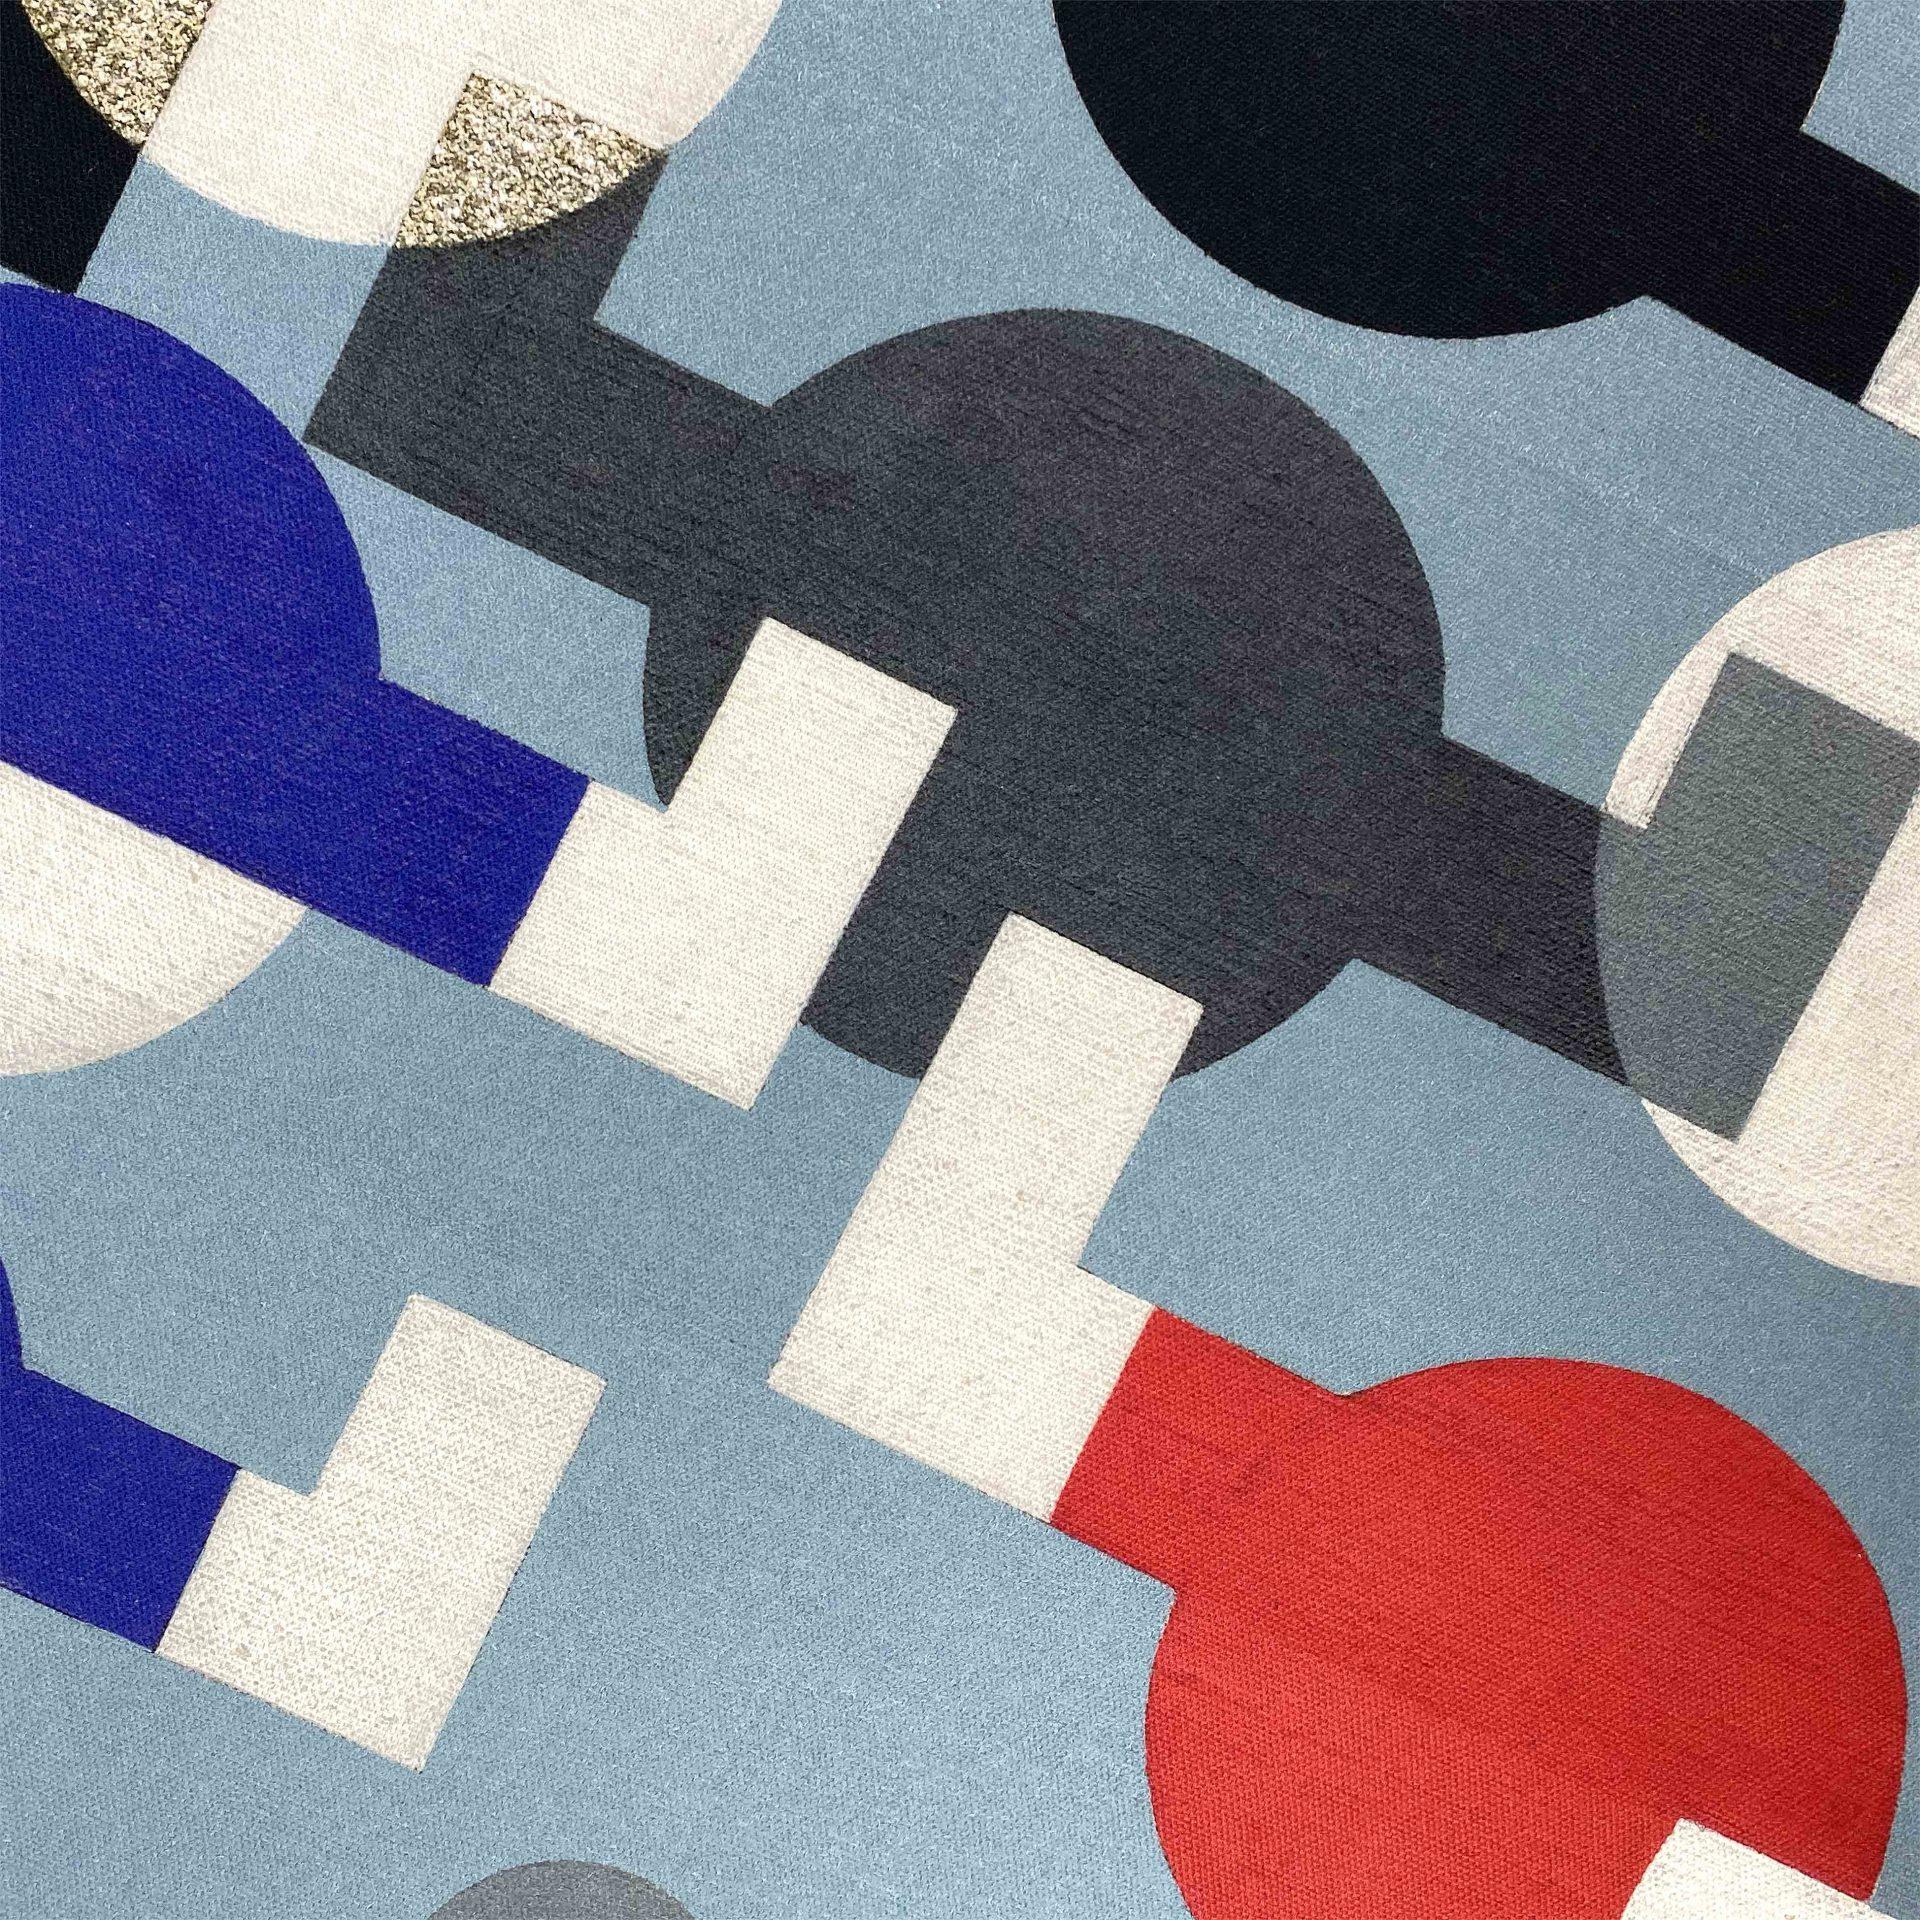 Close up of the printed tea towel for Tate Enterprises Sophie Tauber